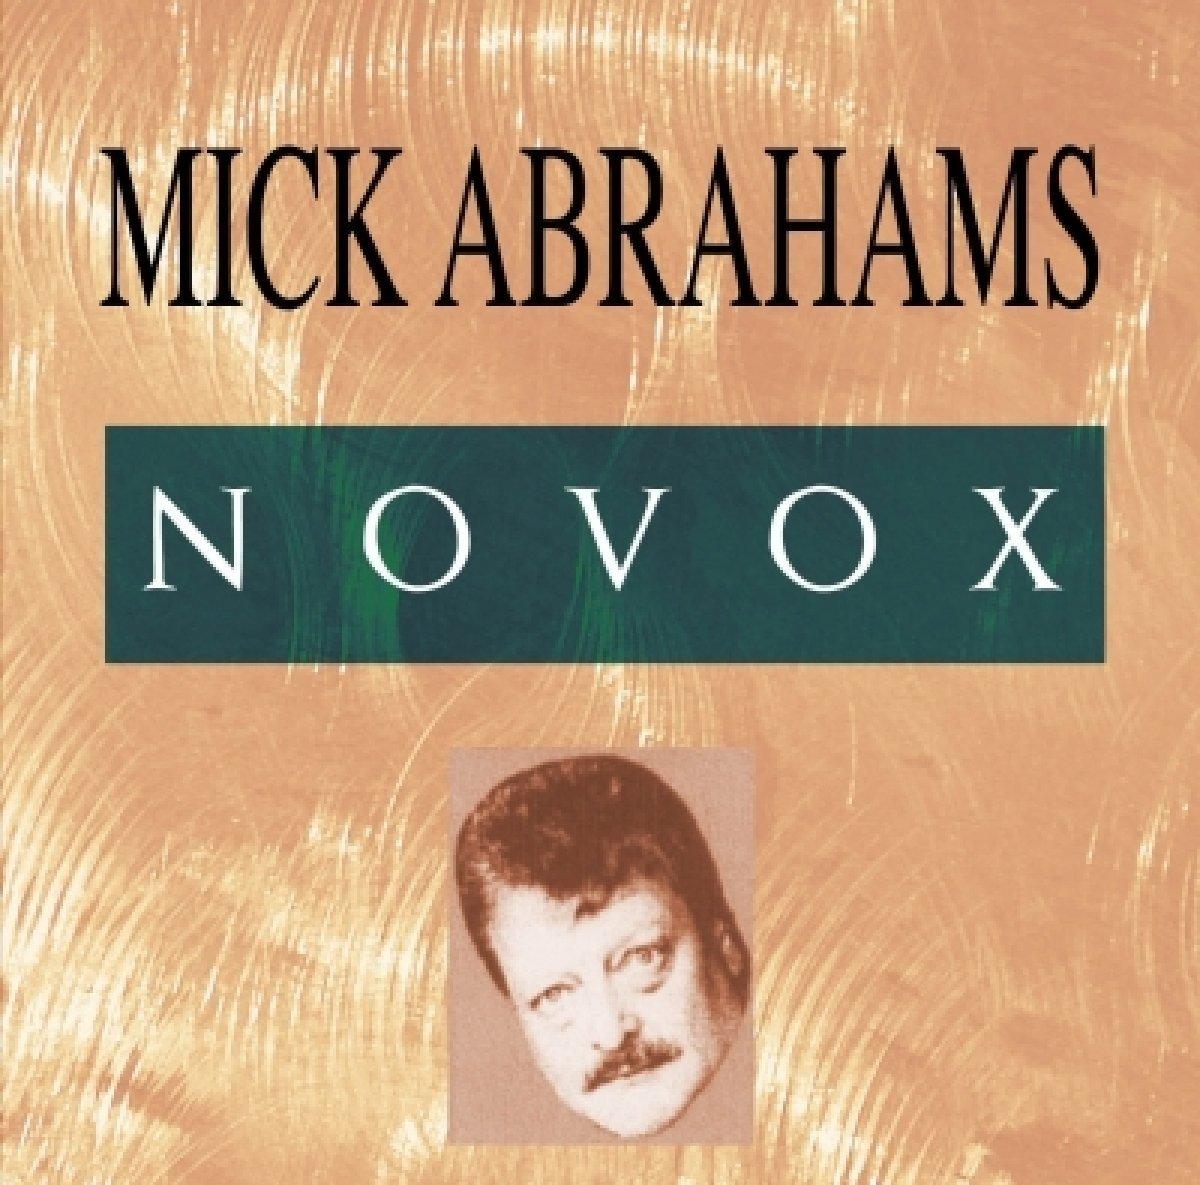 Mick Abrahams — Novox